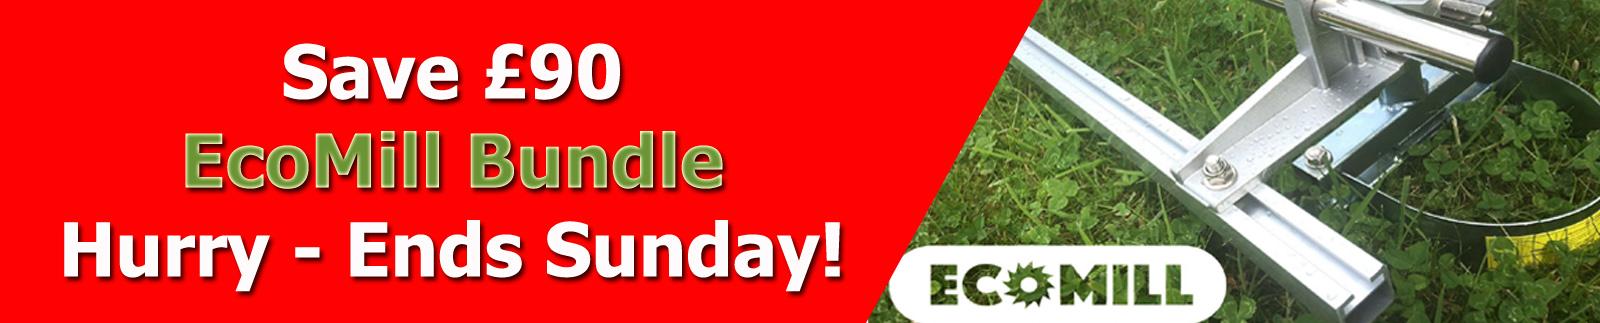 EcoMill Bundle - Save £90 - Ends Sunday!